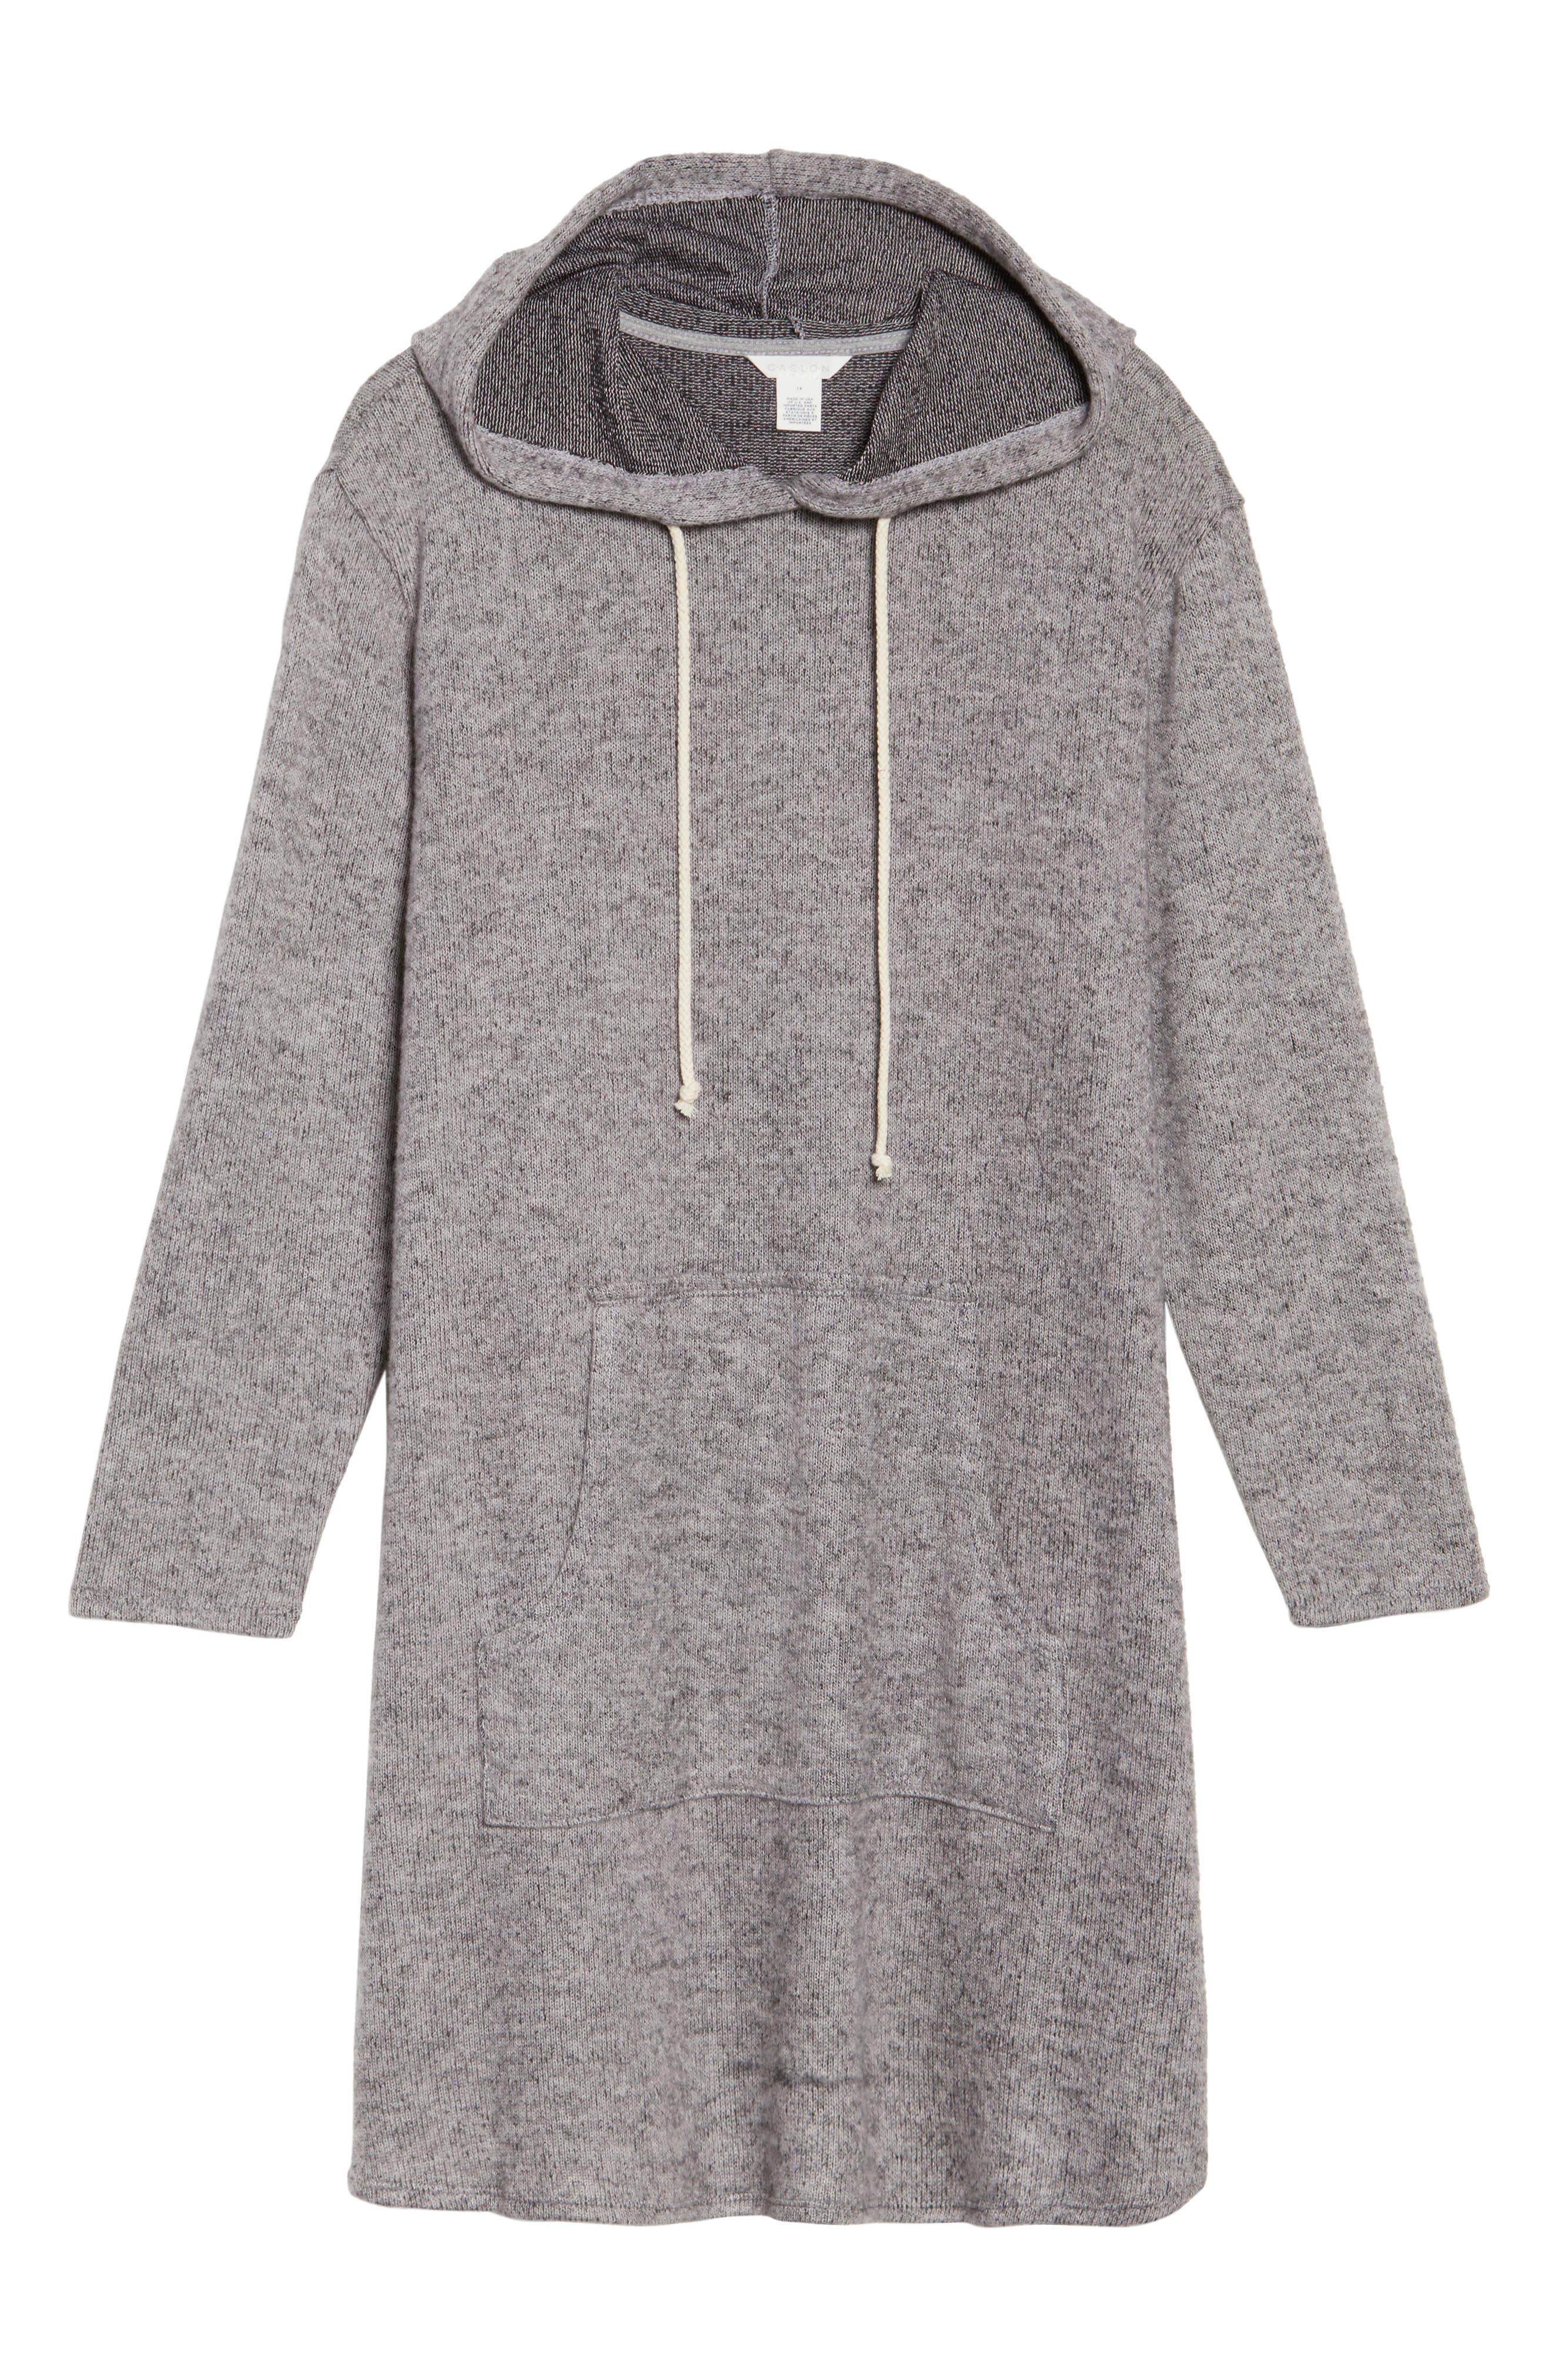 Hooded Knit Tunic,                             Alternate thumbnail 6, color,                             Light Grey